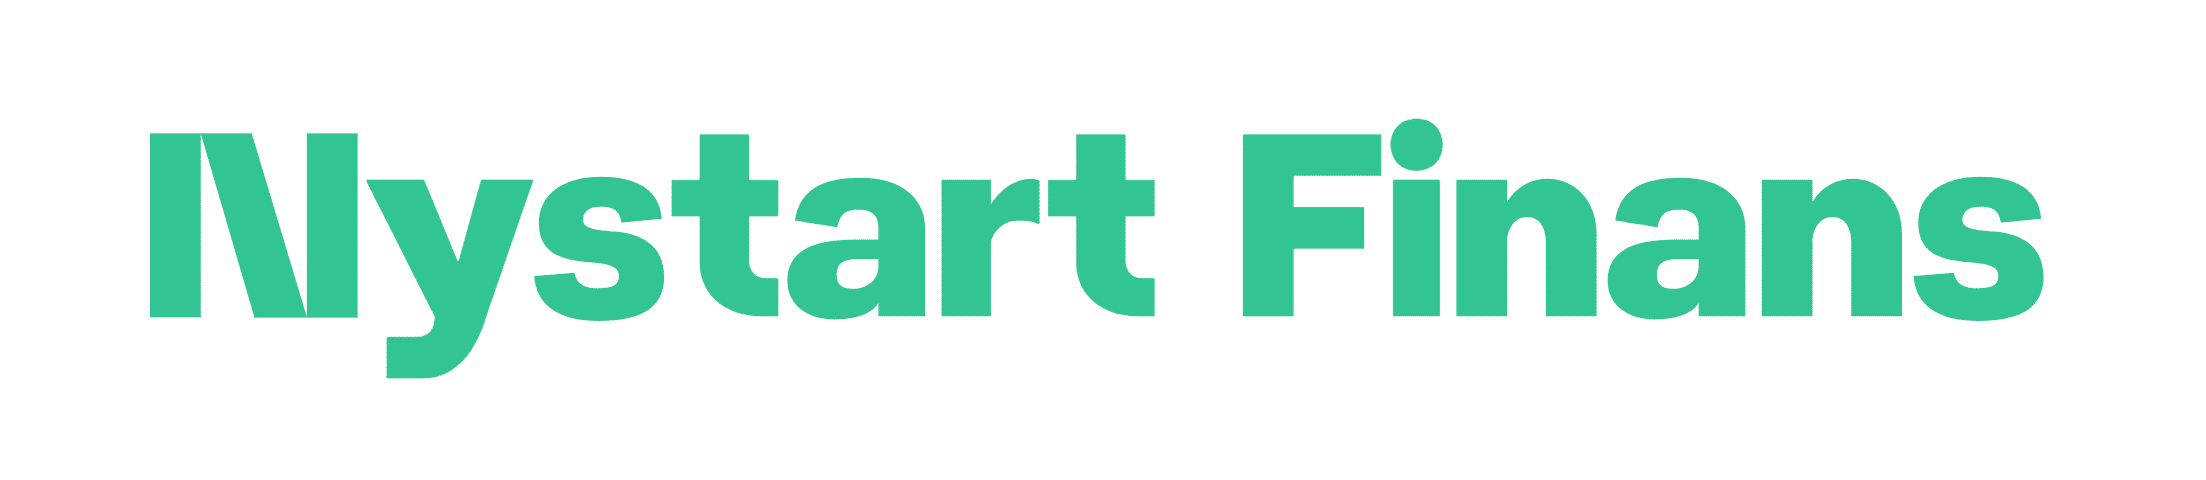 Nystart Finans Sverige AB